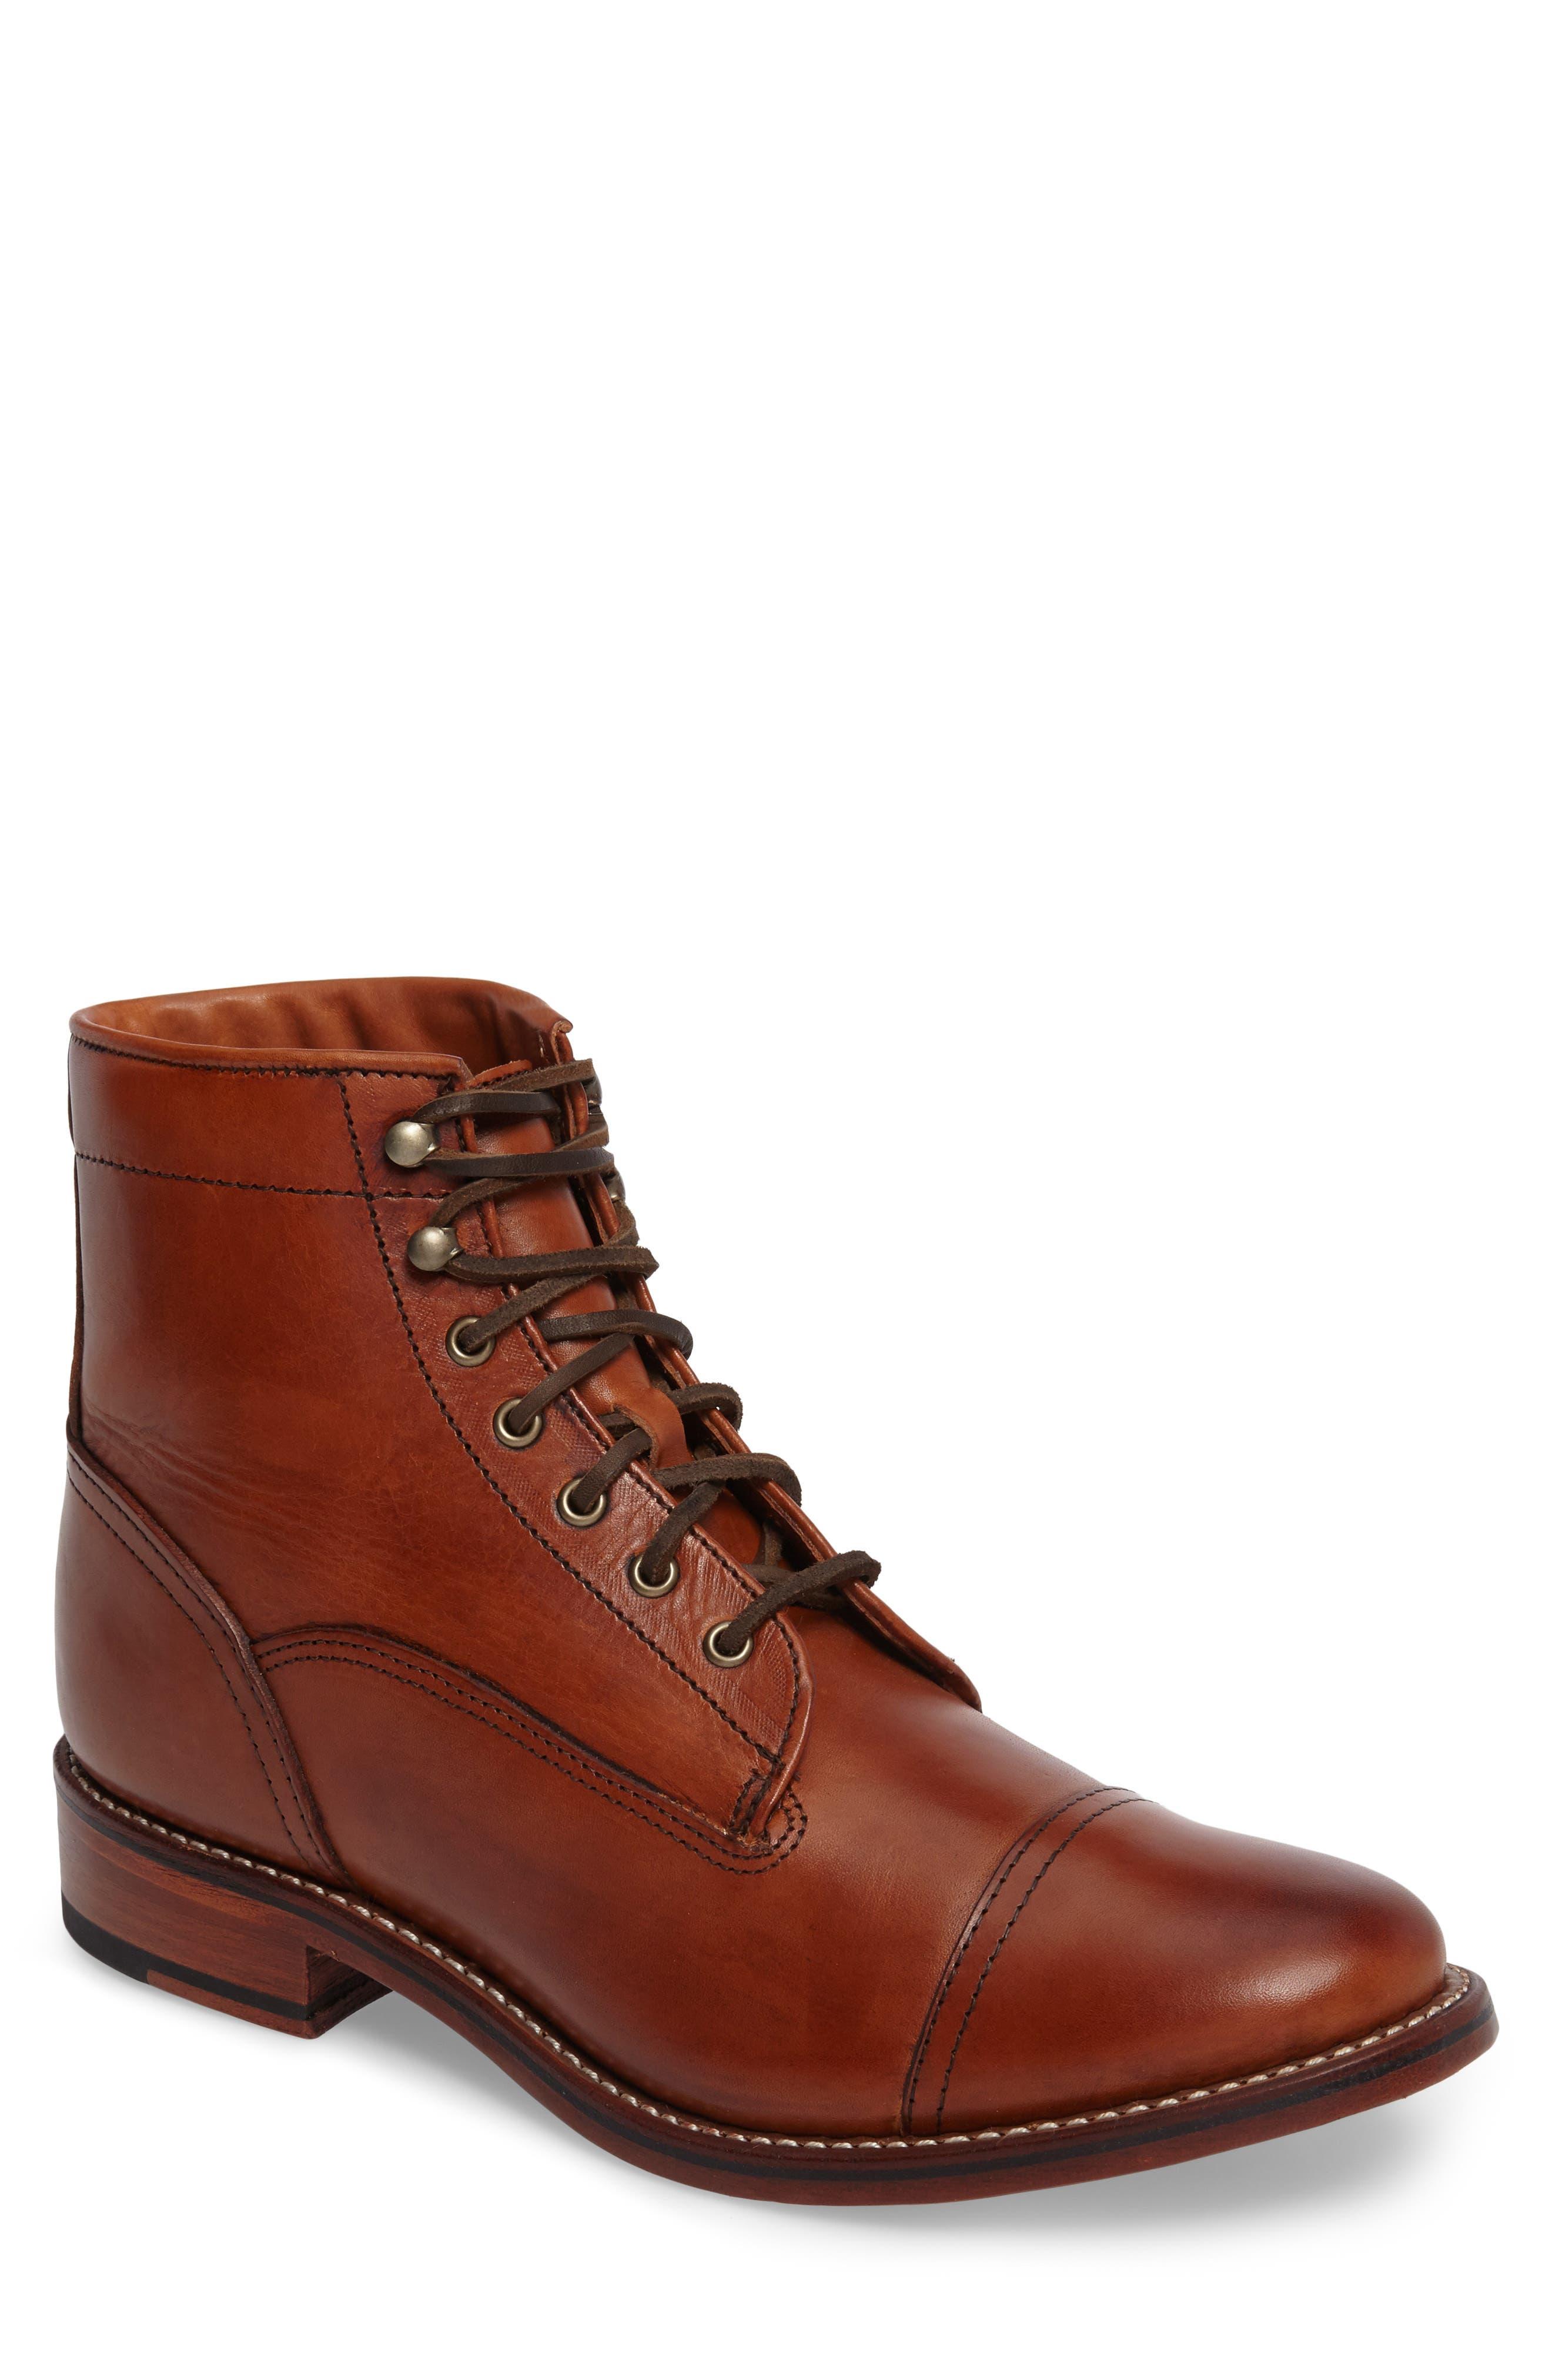 Ariat Highlands Cap Toe Boot (Men)